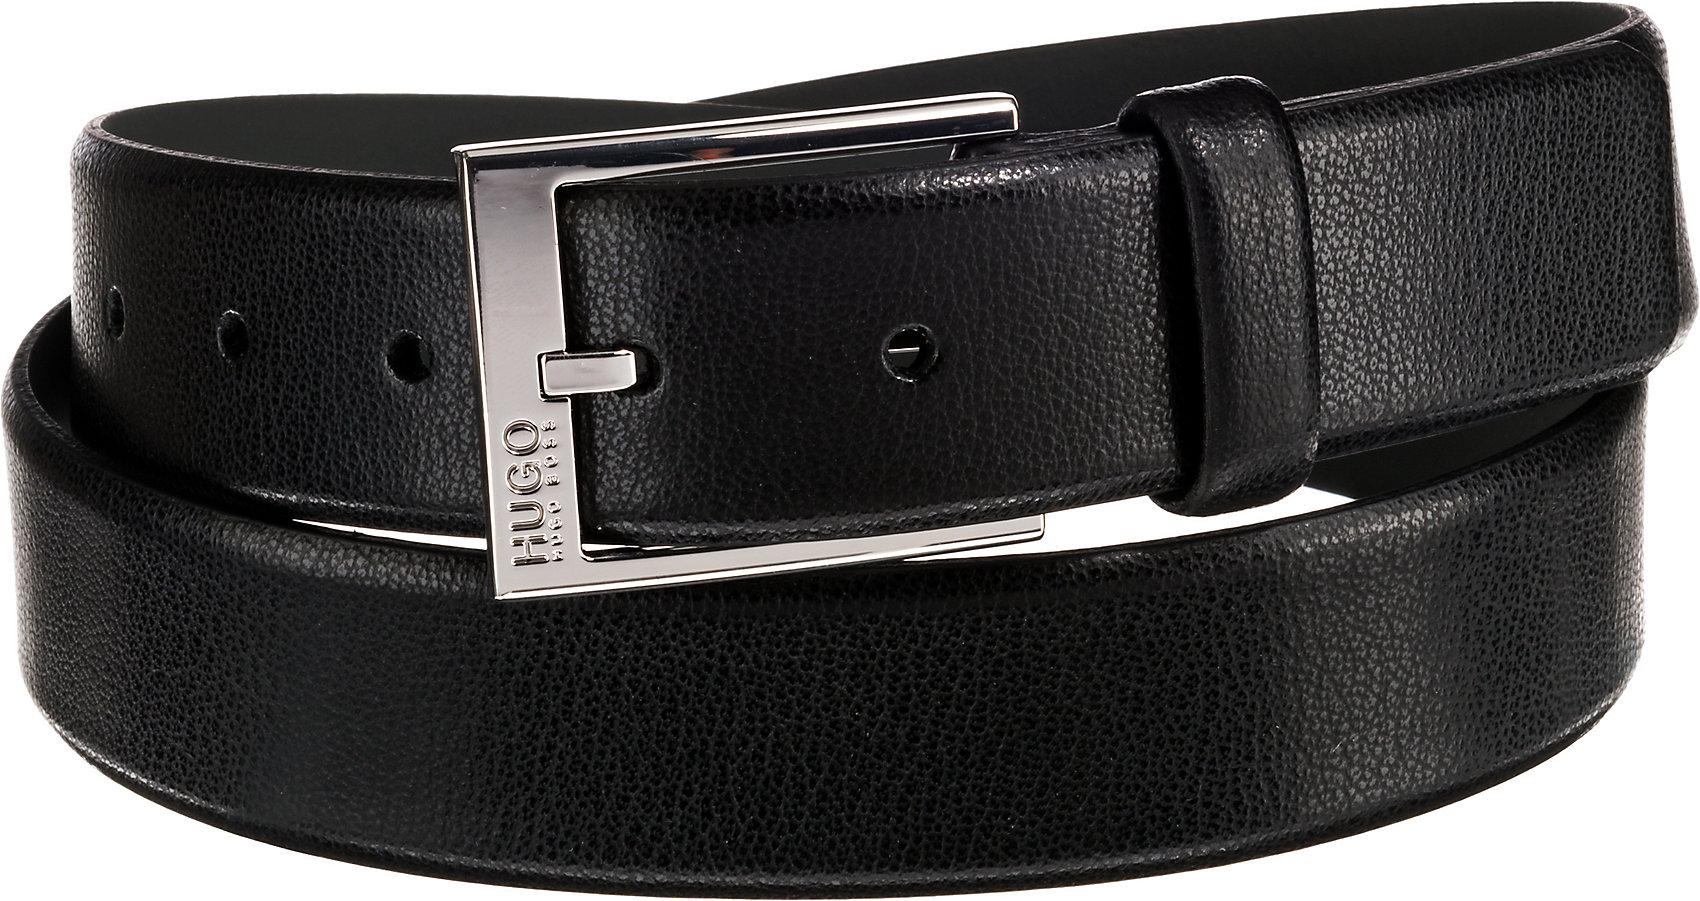 Neu Hugo Boss Model  Gellot    Gürtel 10235211 für Herren       Luxus  5a8a3f